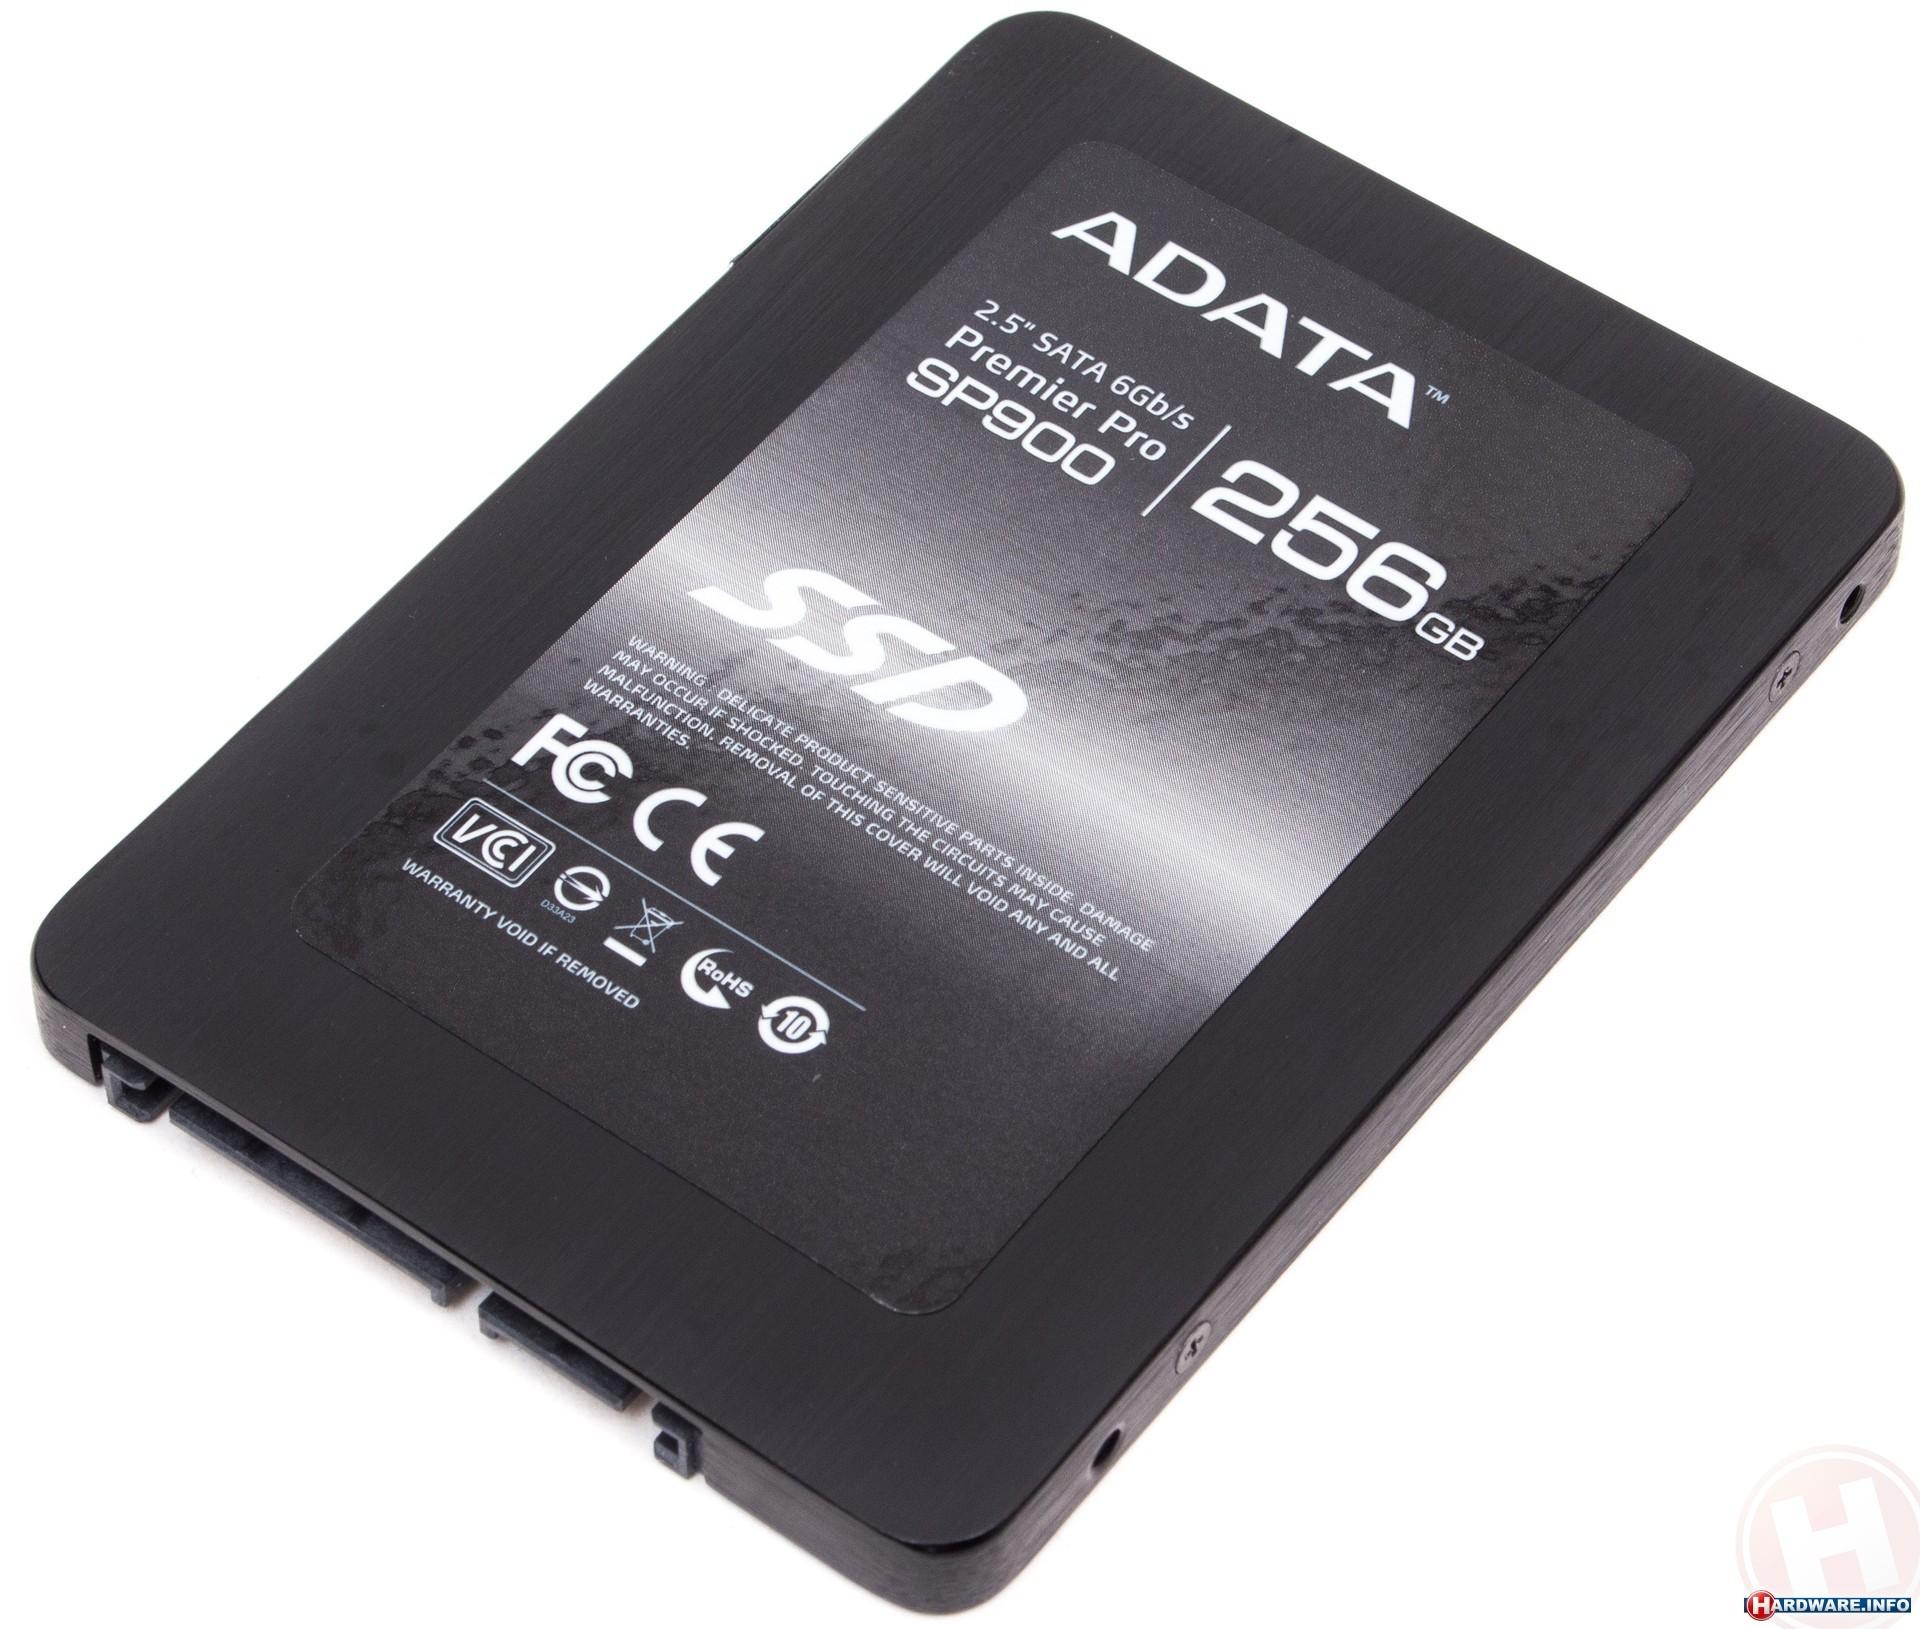 SSD ADATA 256GB SP900 - ADATA SSD Premier Pro SP900 256